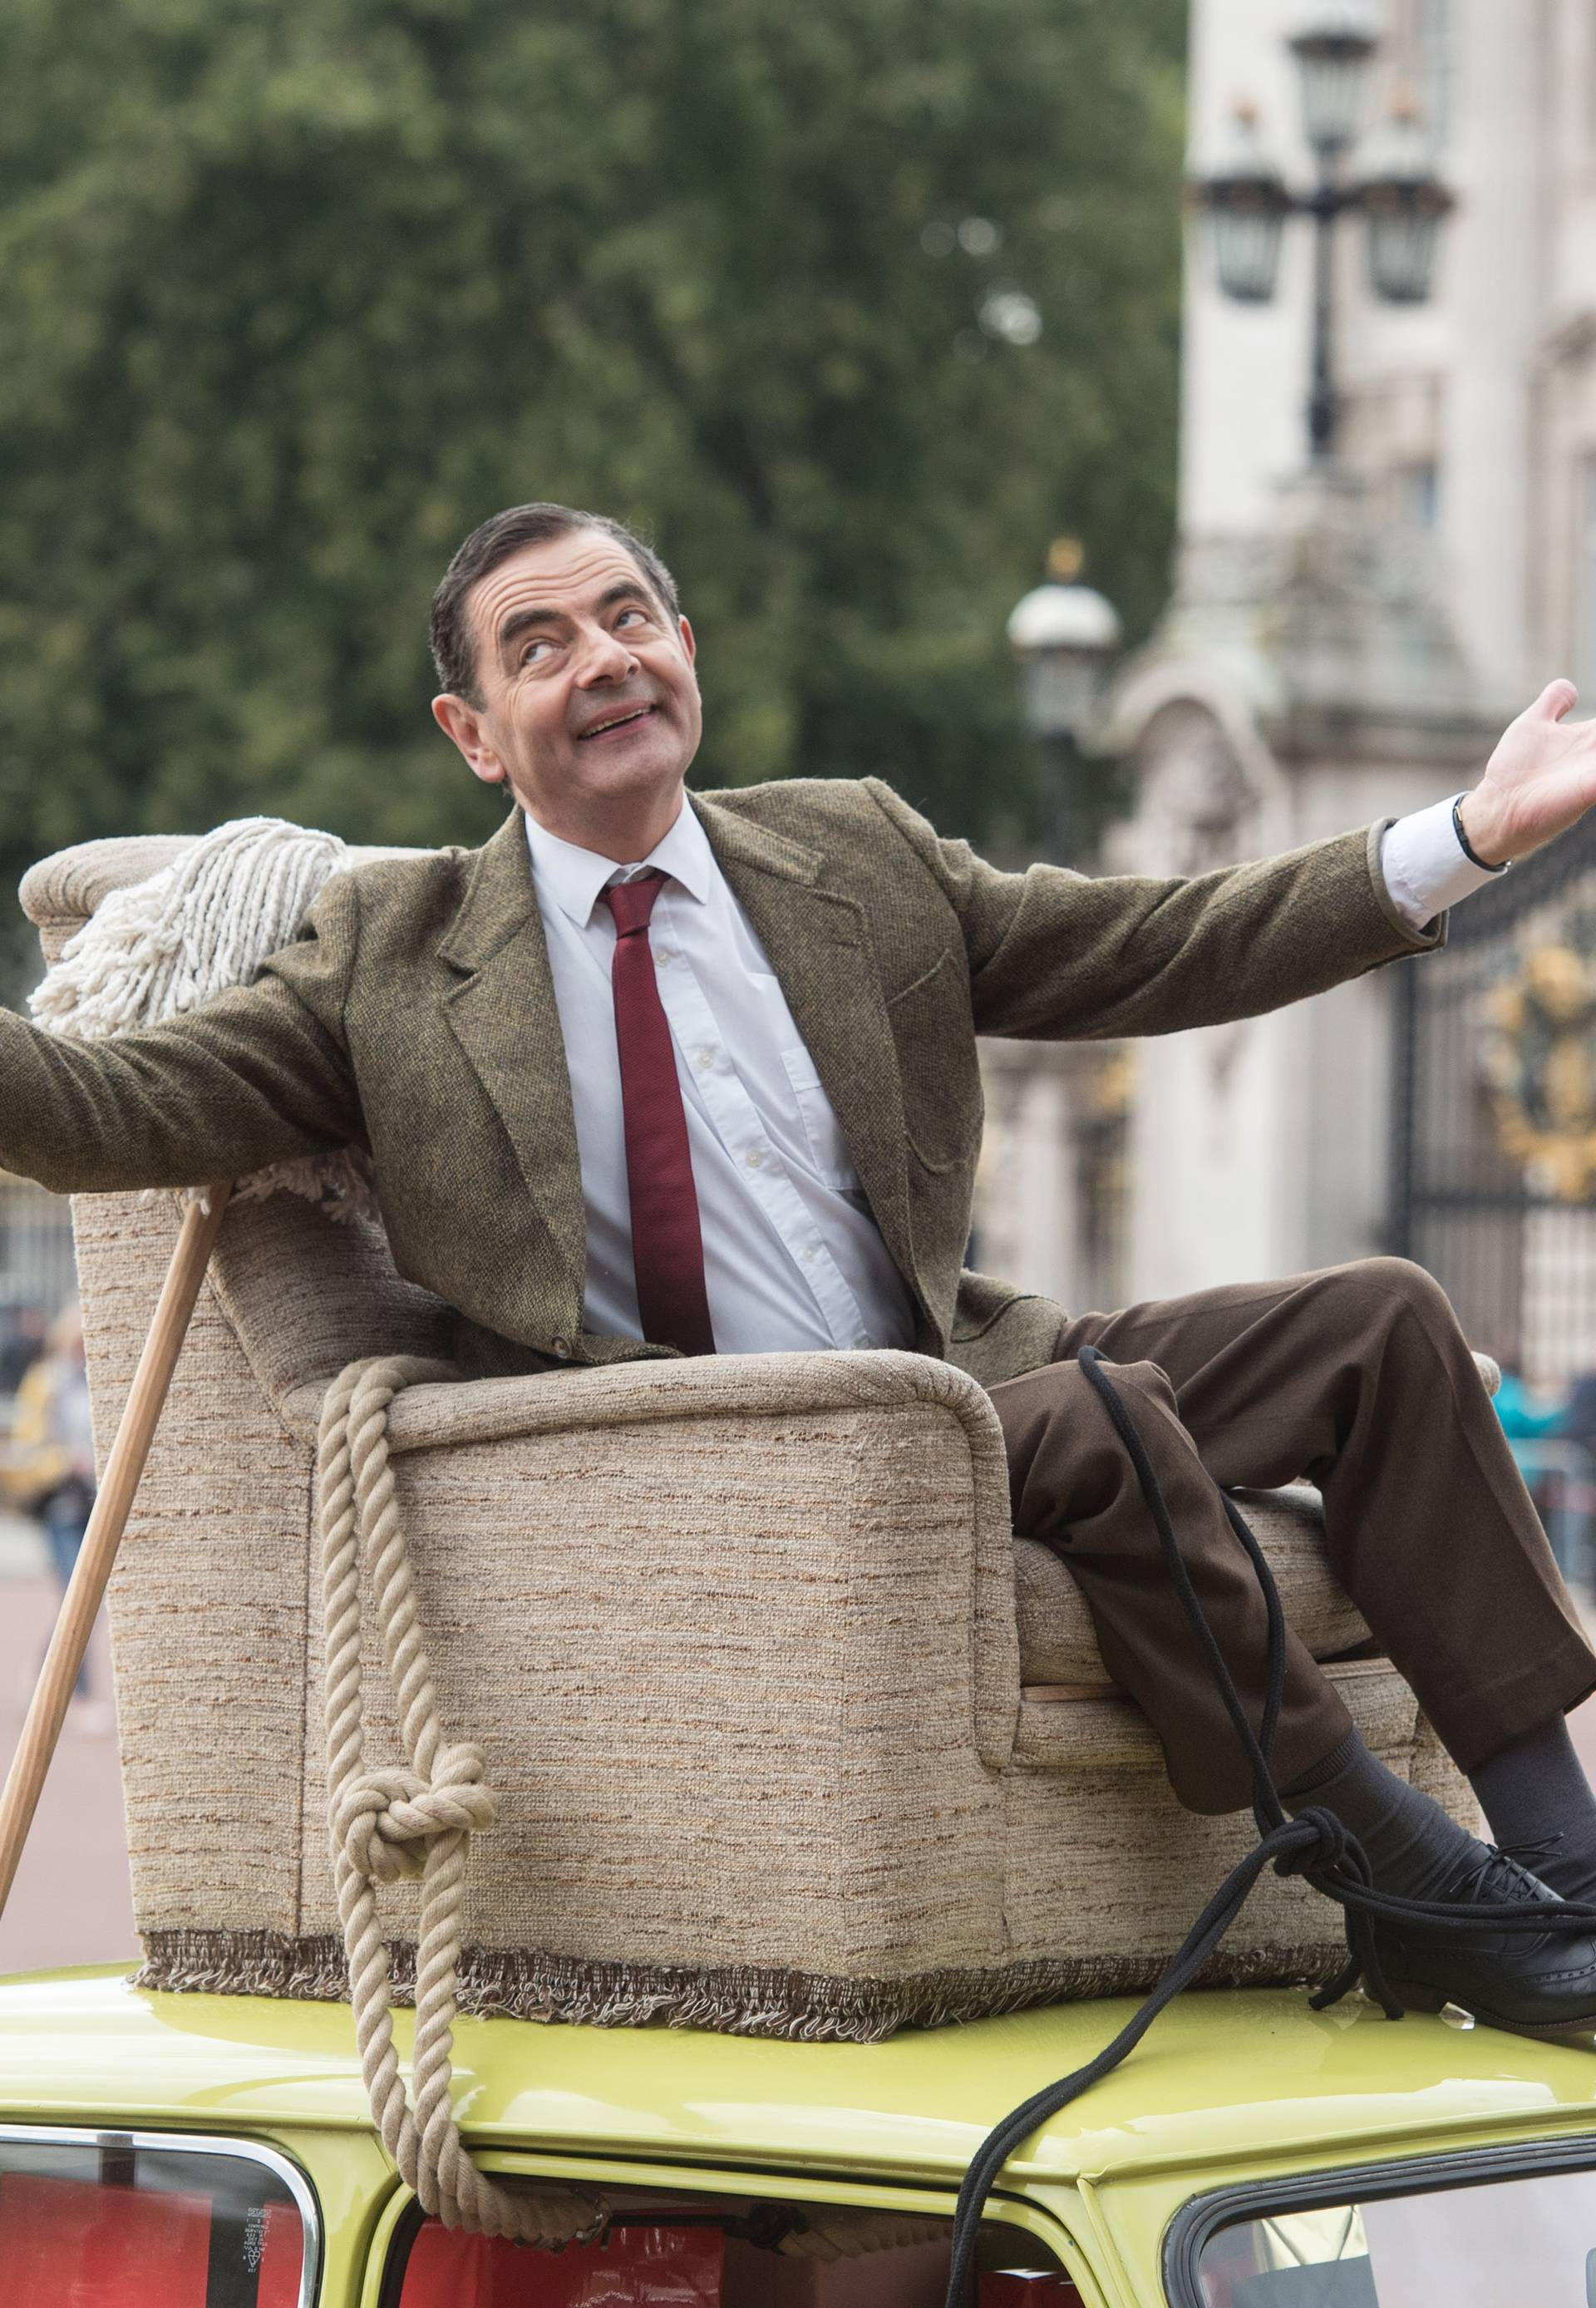 Mr Bean at Buckingham Palace